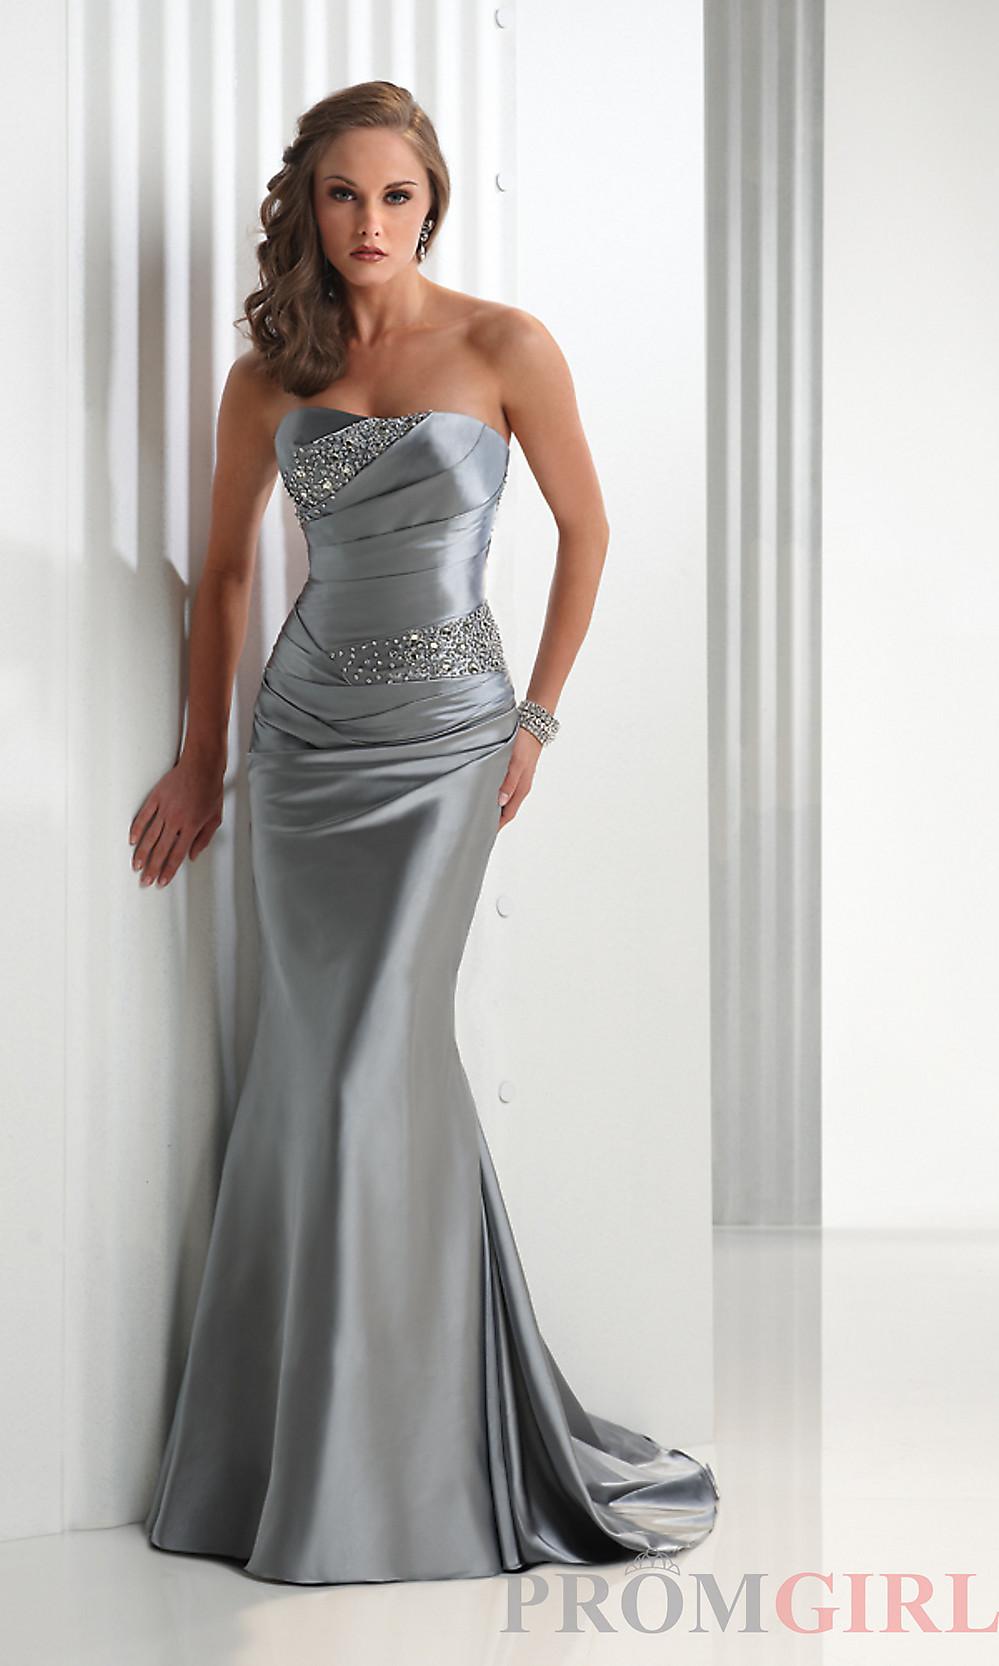 Silver dresses short 2016 style jeans silver dresses ombrellifo Images